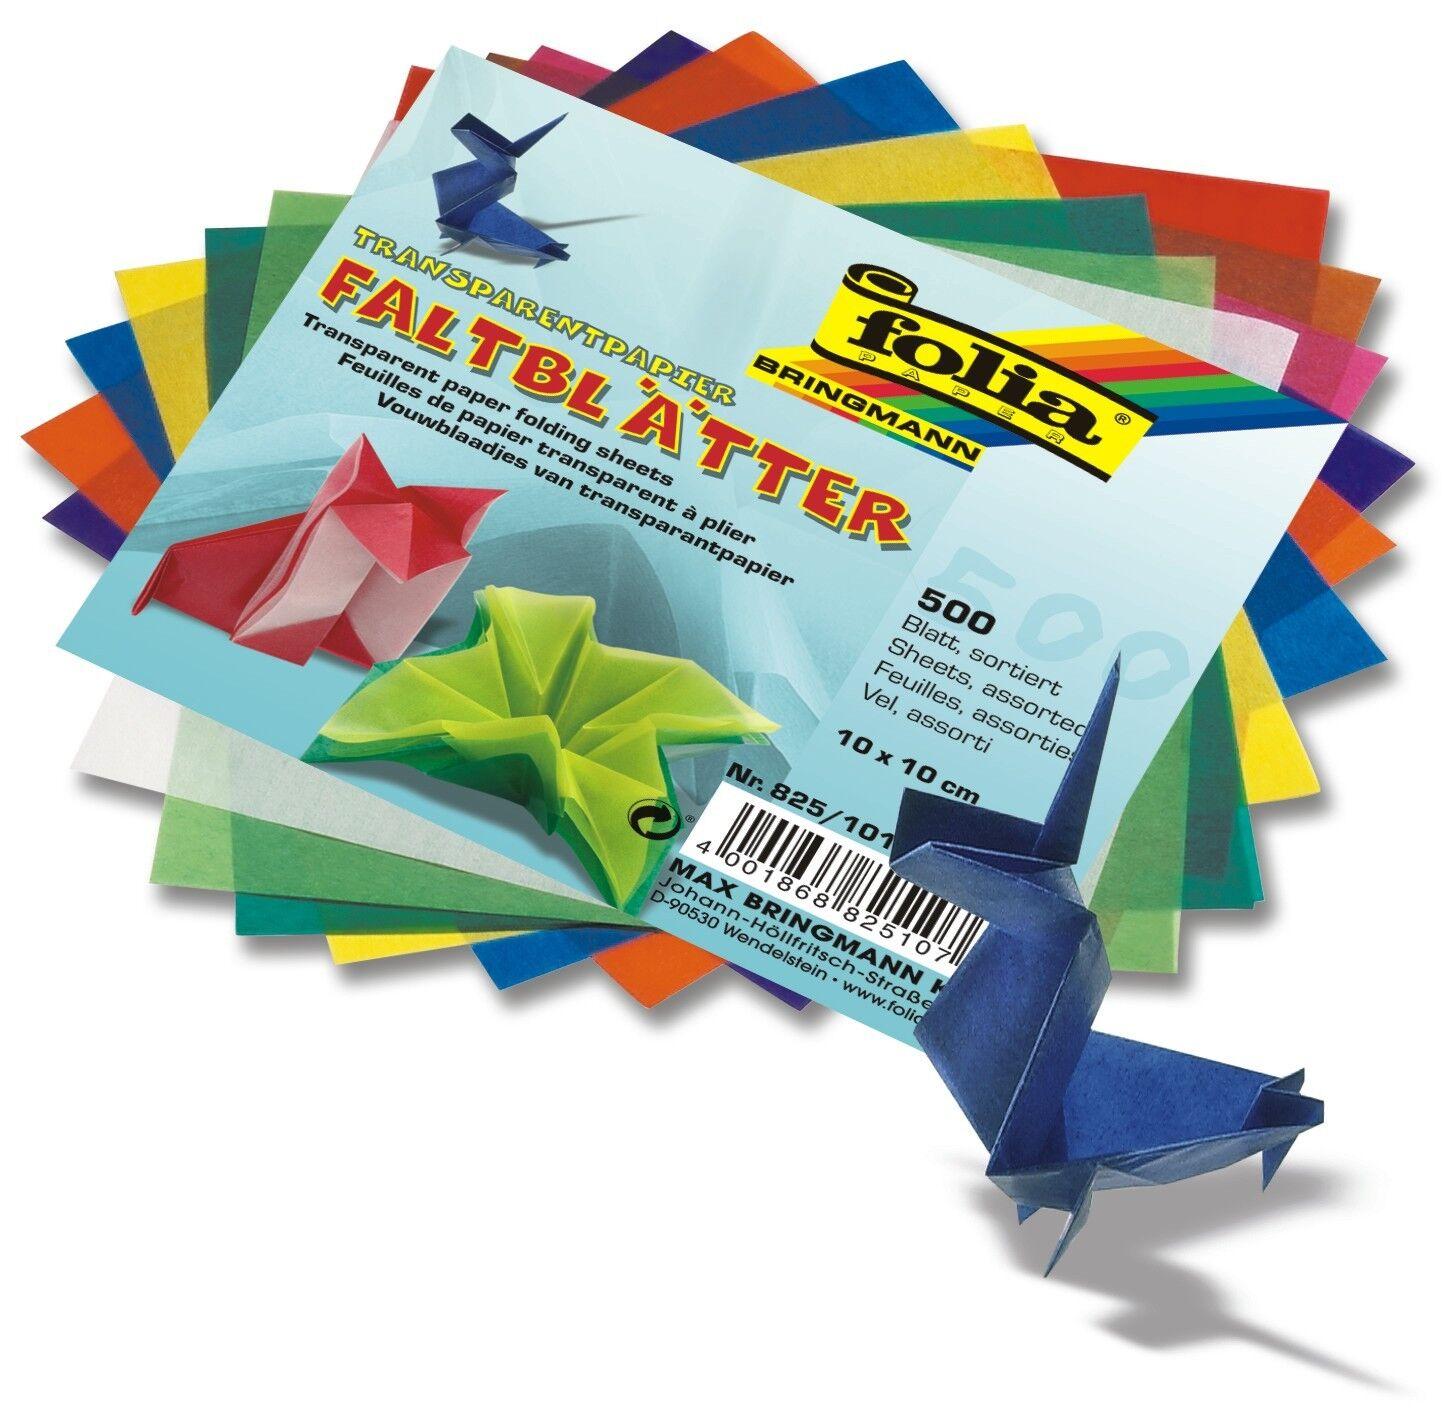 Faltblätter Origami Transparentpapier 10x10cm 42g/m²  500 Blatt in 10 Farben